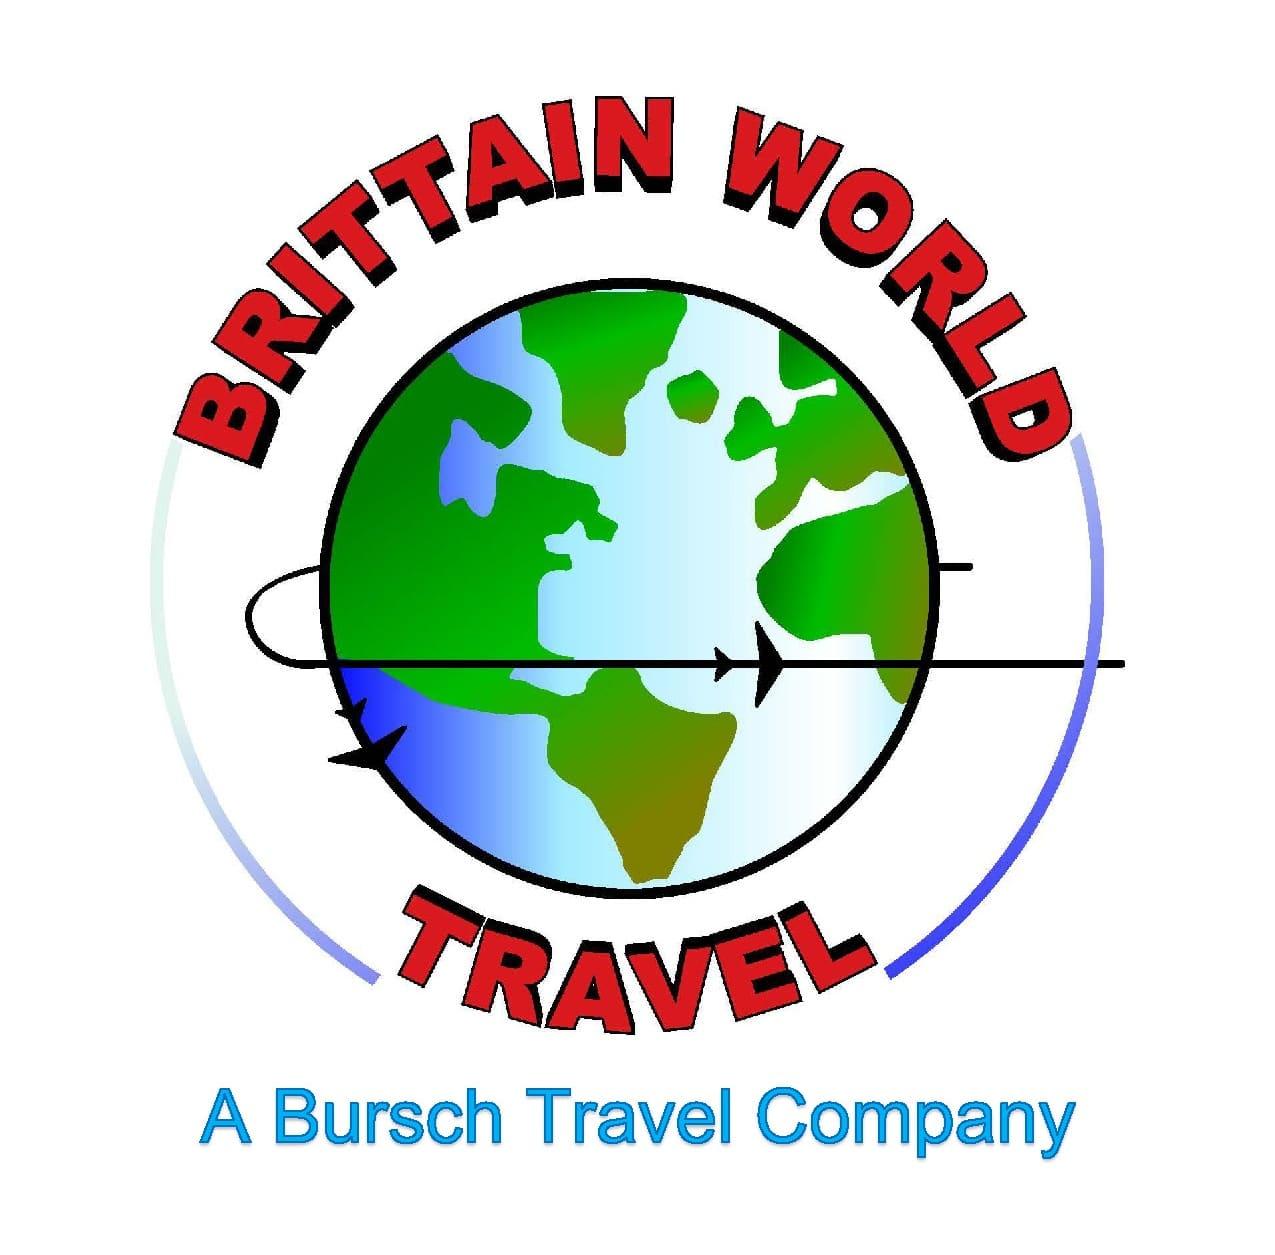 Brittain World Travel – A Division of Burch Travel